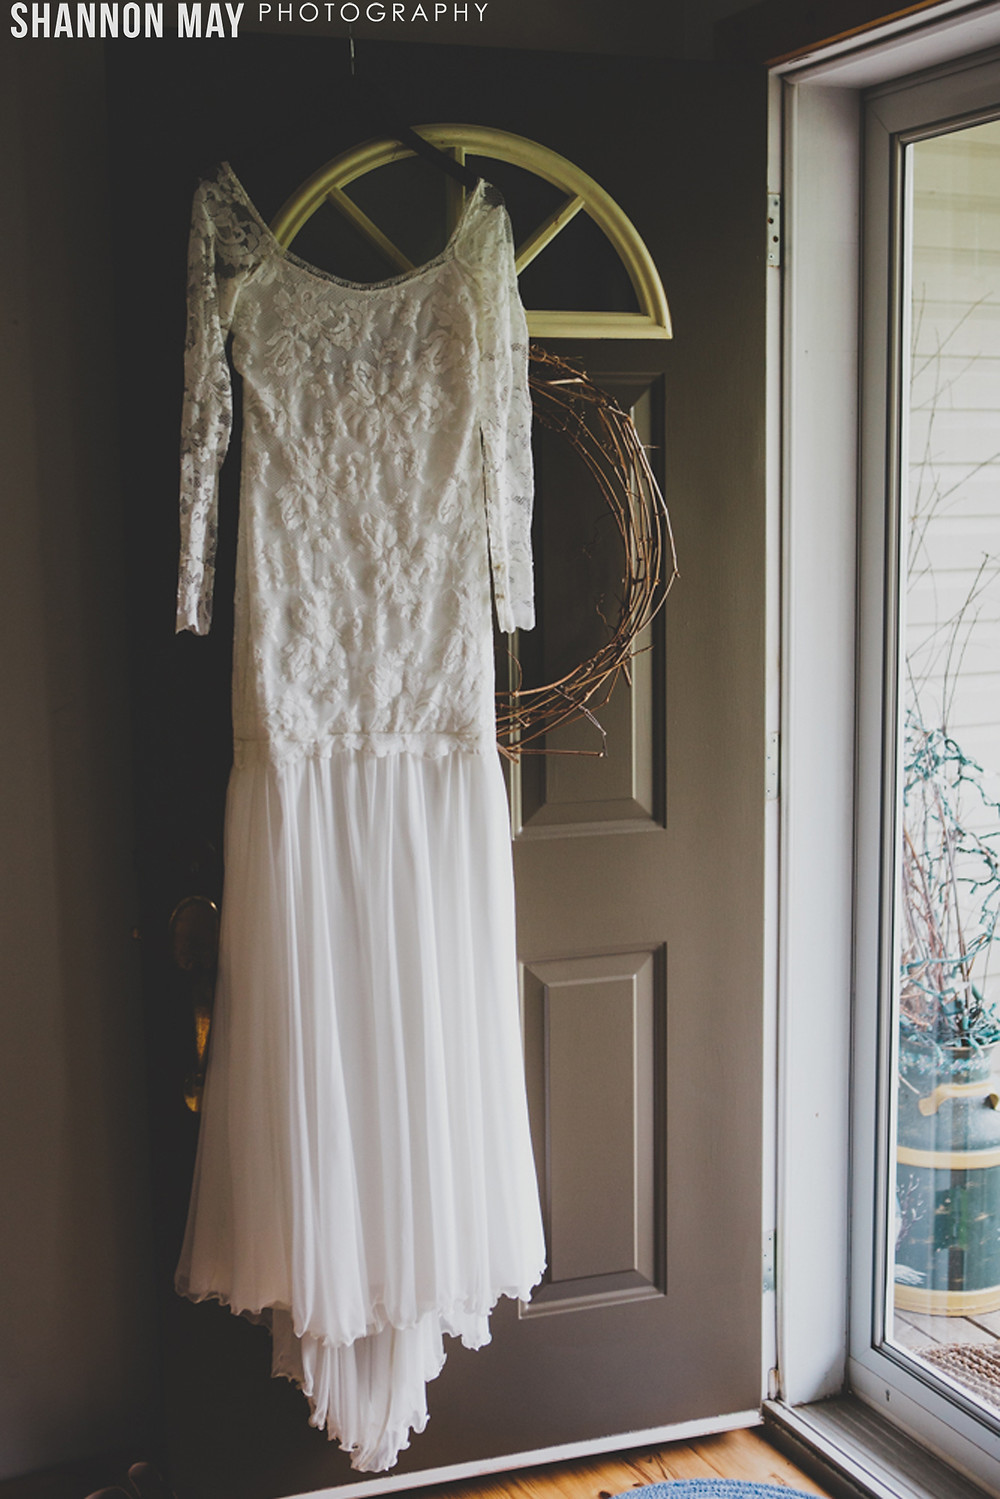 20150718 WEDDING Stef & Marc ShannonMayPhotography 003